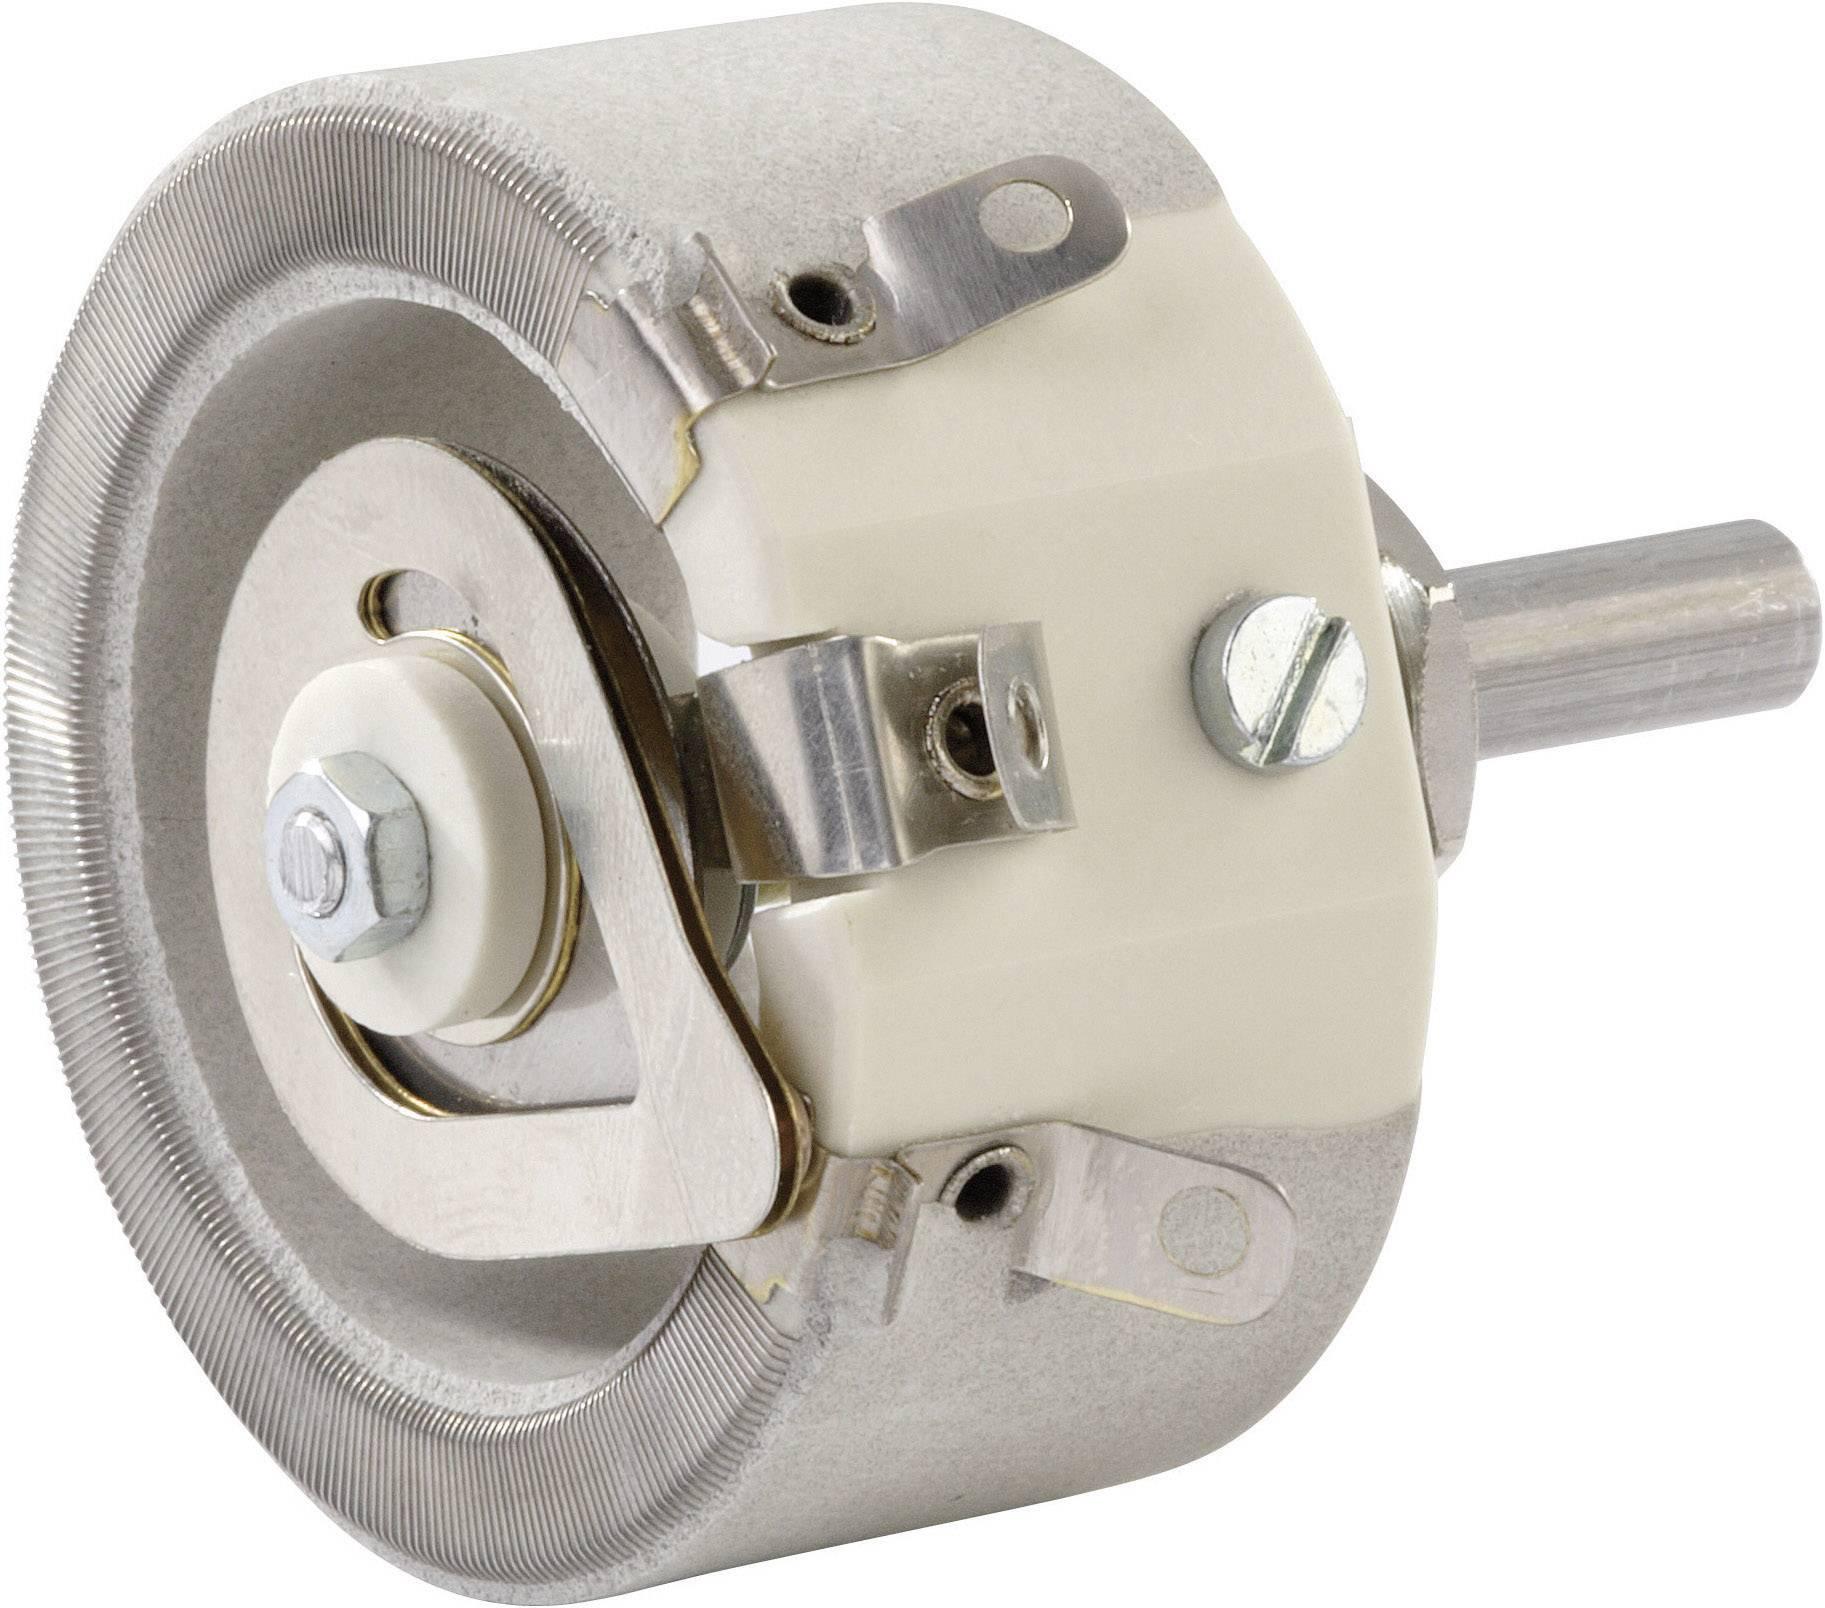 Drôtový potenciometer mono TT Electronics AB 3191103900 3191103900, 30 W, 47 Ohm, 1 ks